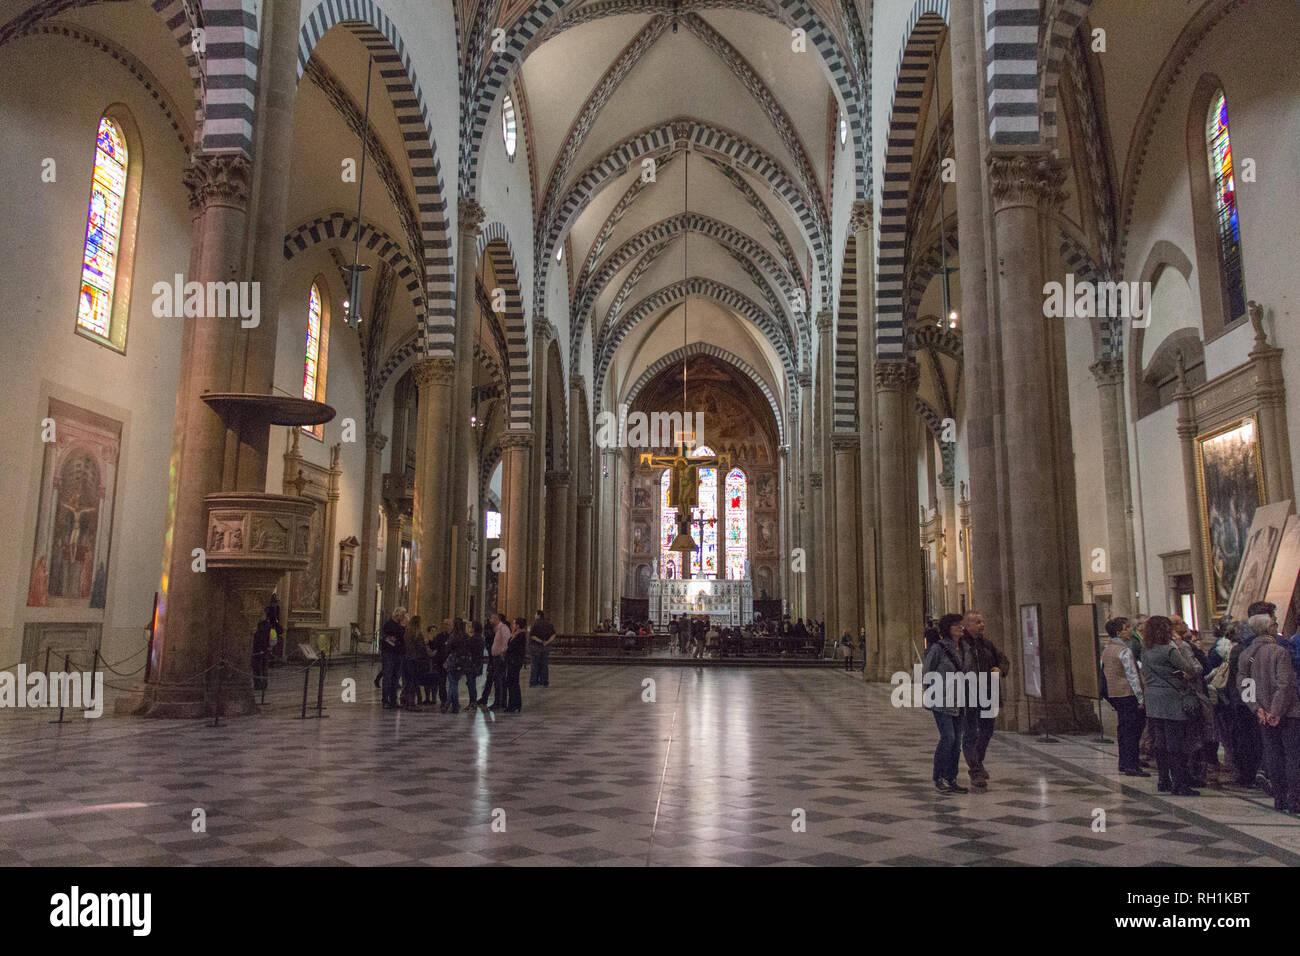 Italy, Florence - April 02 2017: the interior view of Santa Maria Novella Church on April 02 2017, Tuscany, Italy. Stock Photo